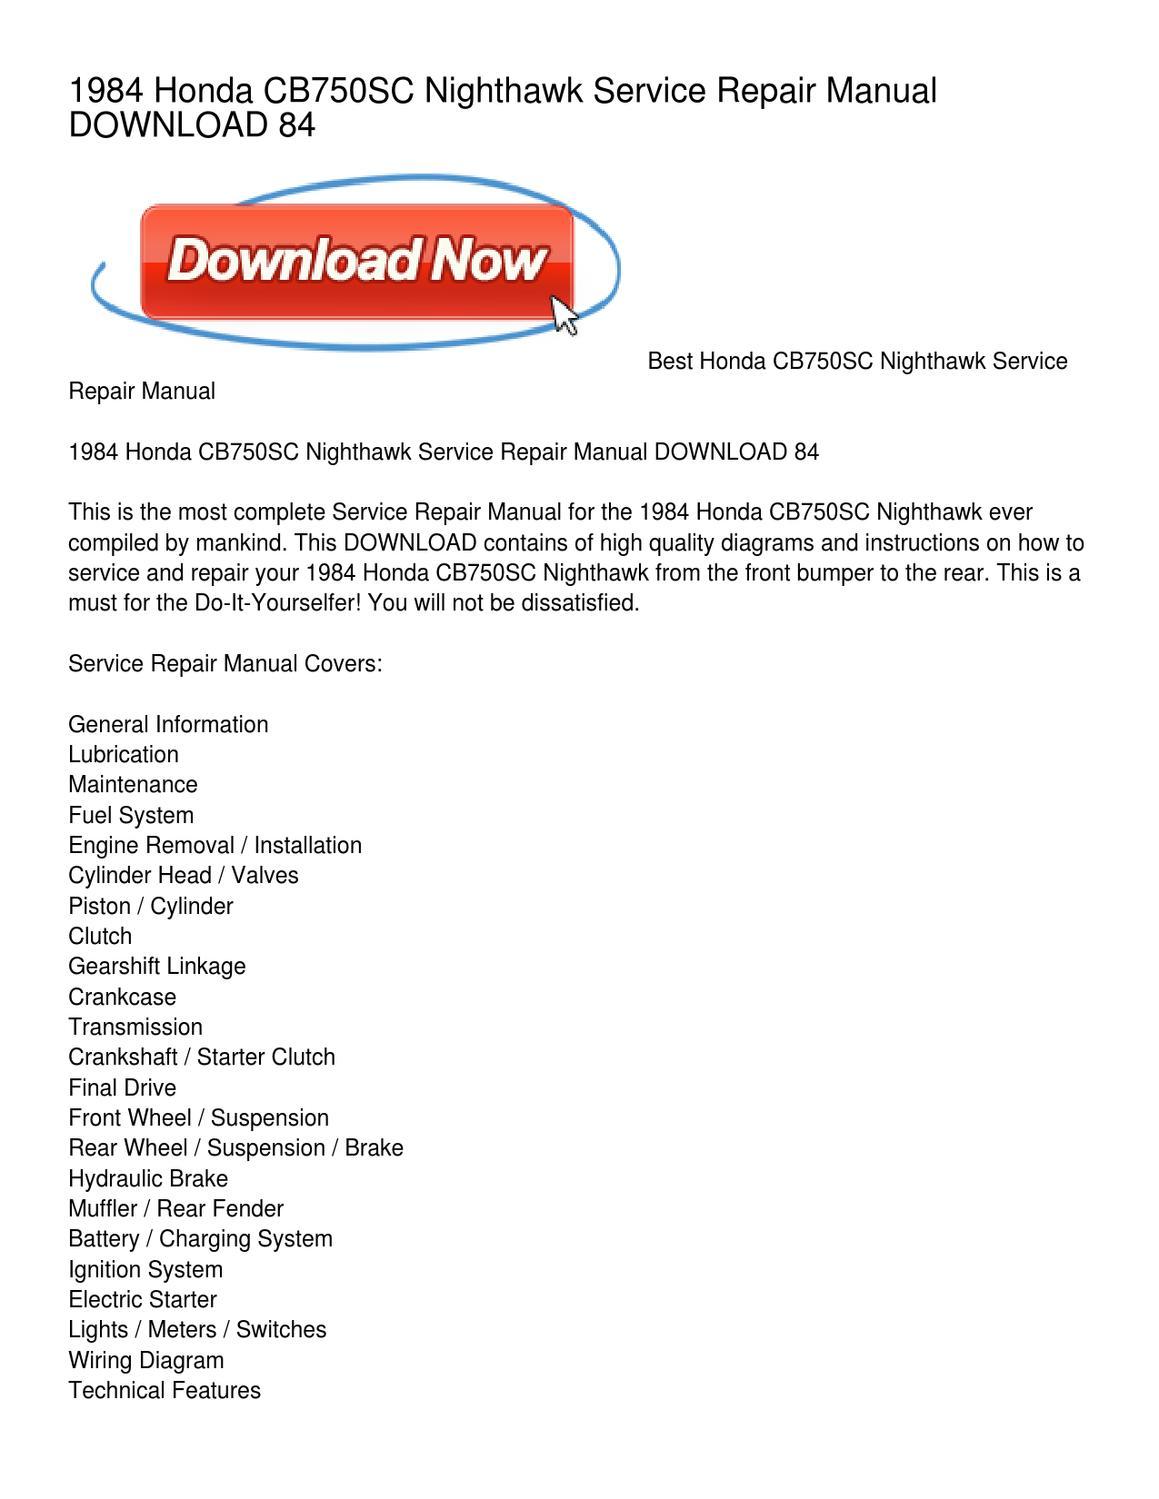 1984 honda cb750sc nighthawk service repair manual download 84 by rh issuu com